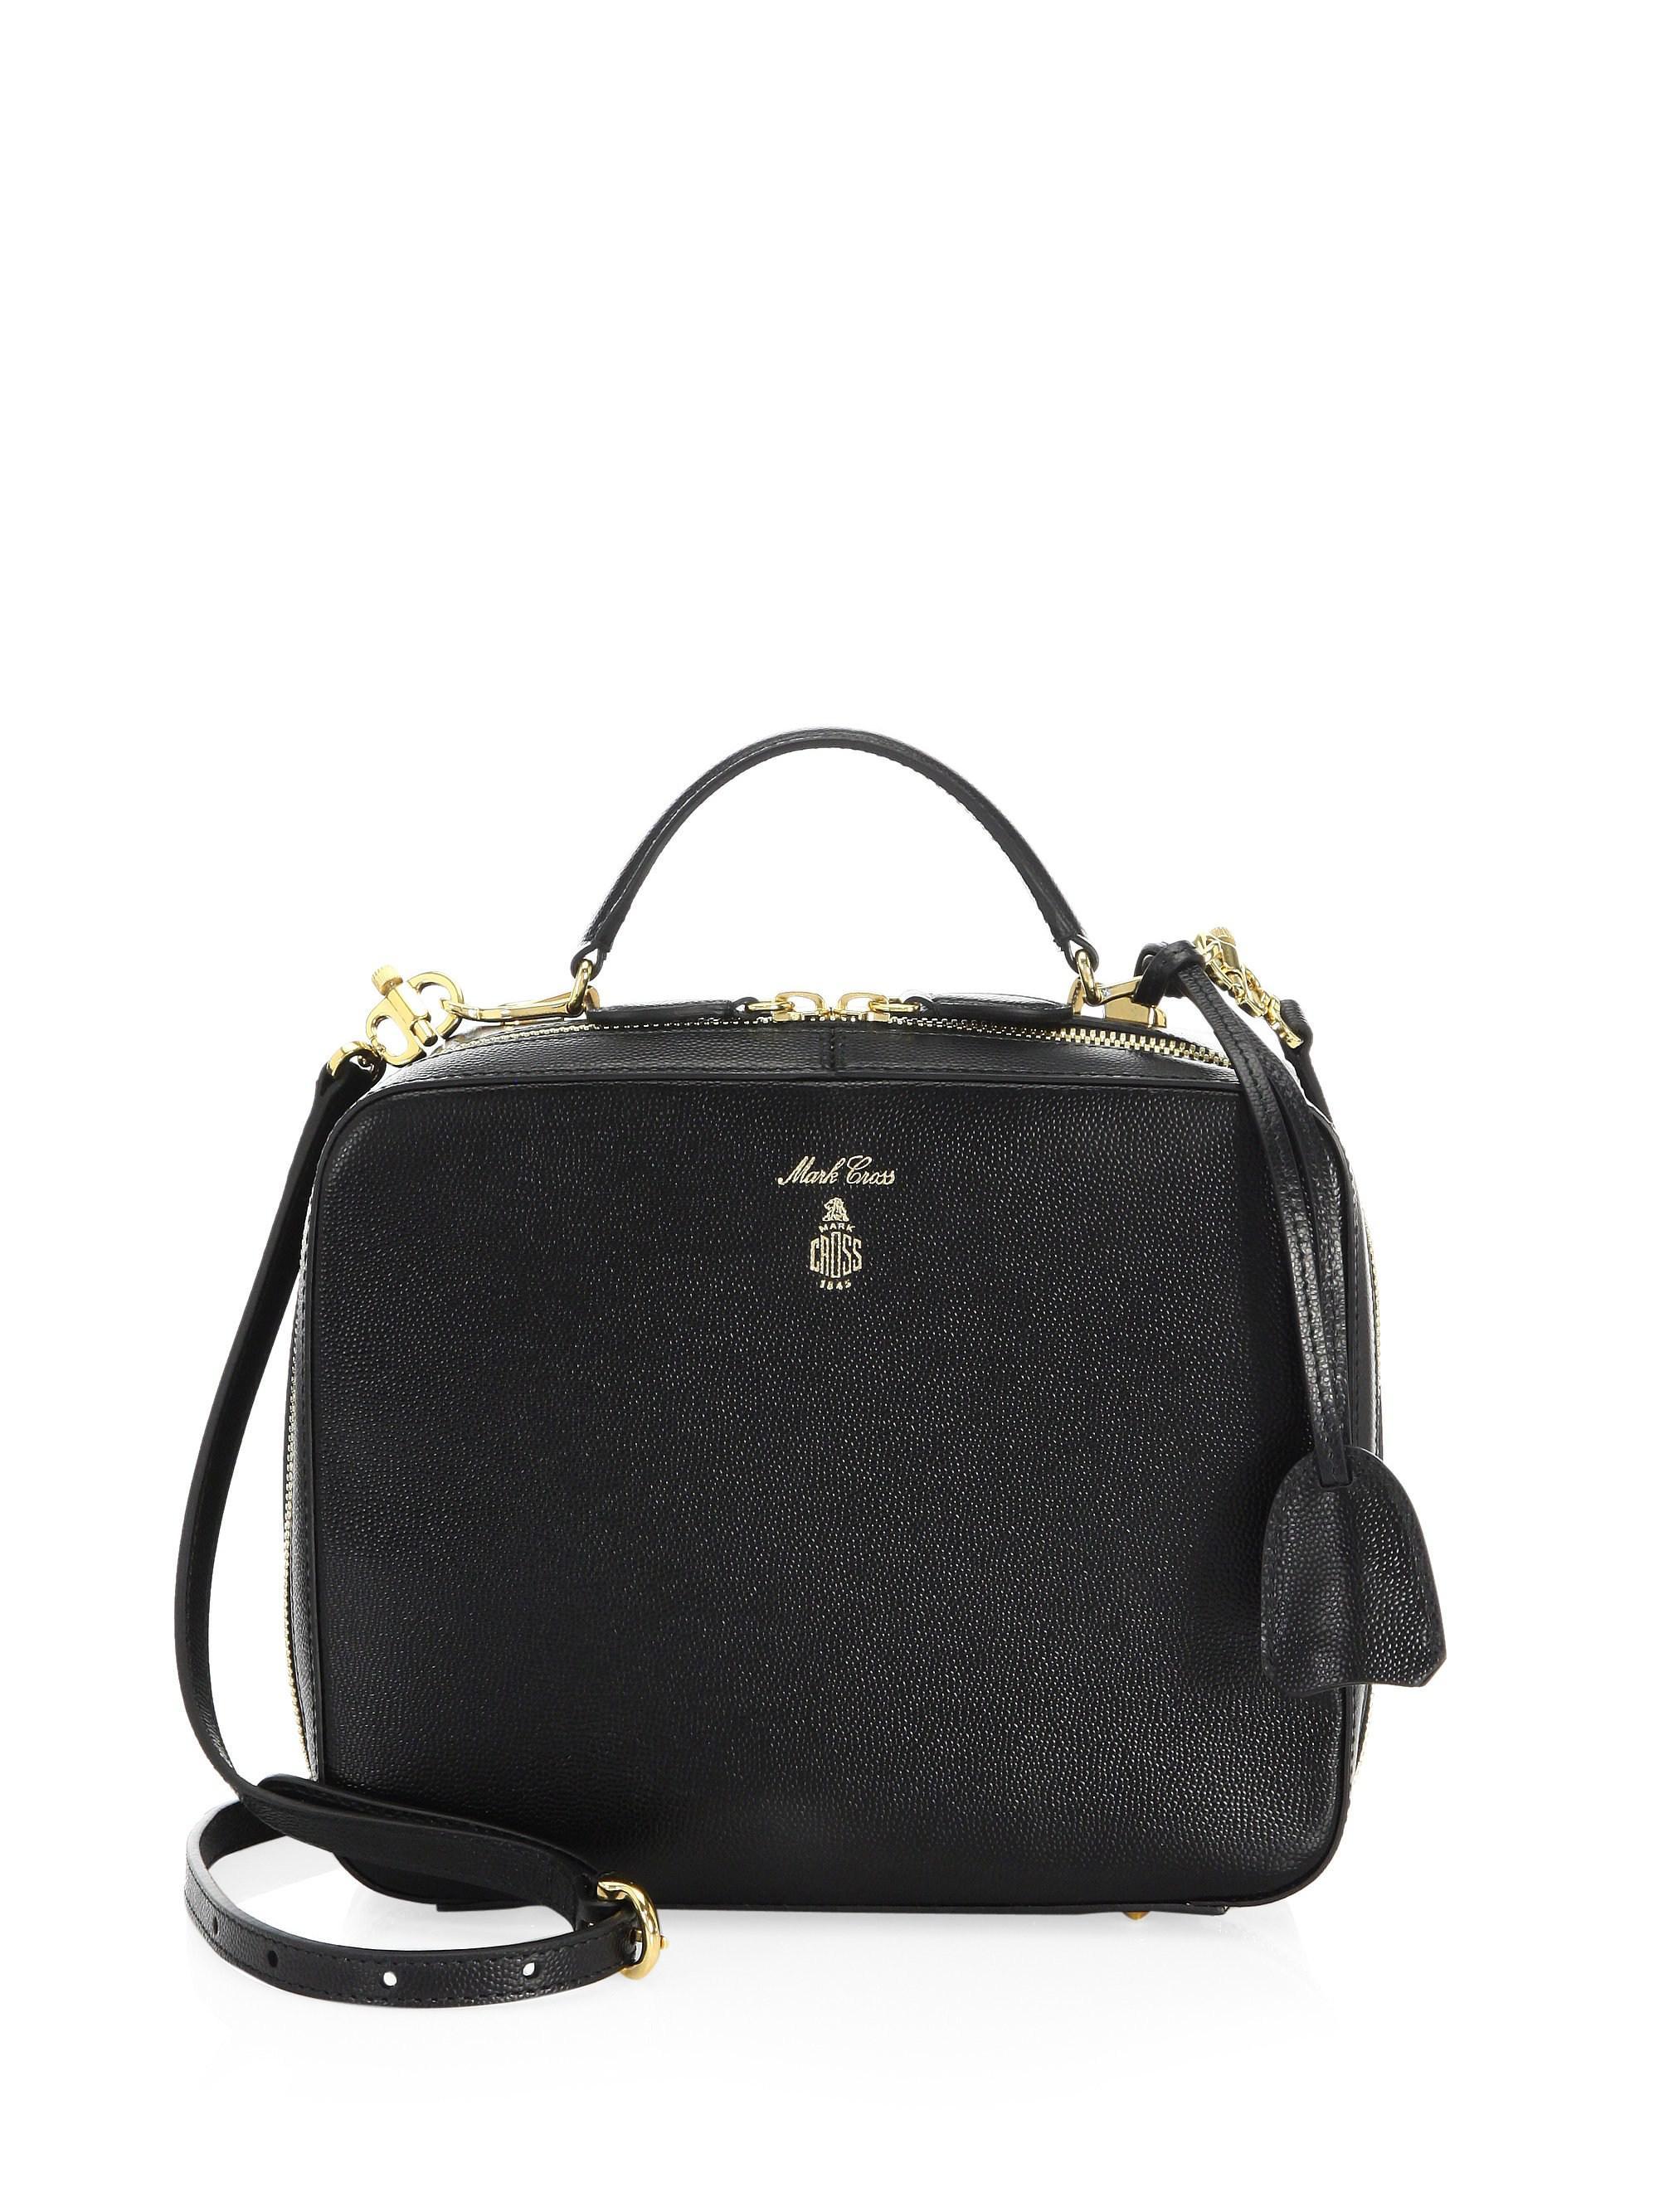 e31770681e1 Lyst - Mark Cross Laura Leather Mini Bag in Black